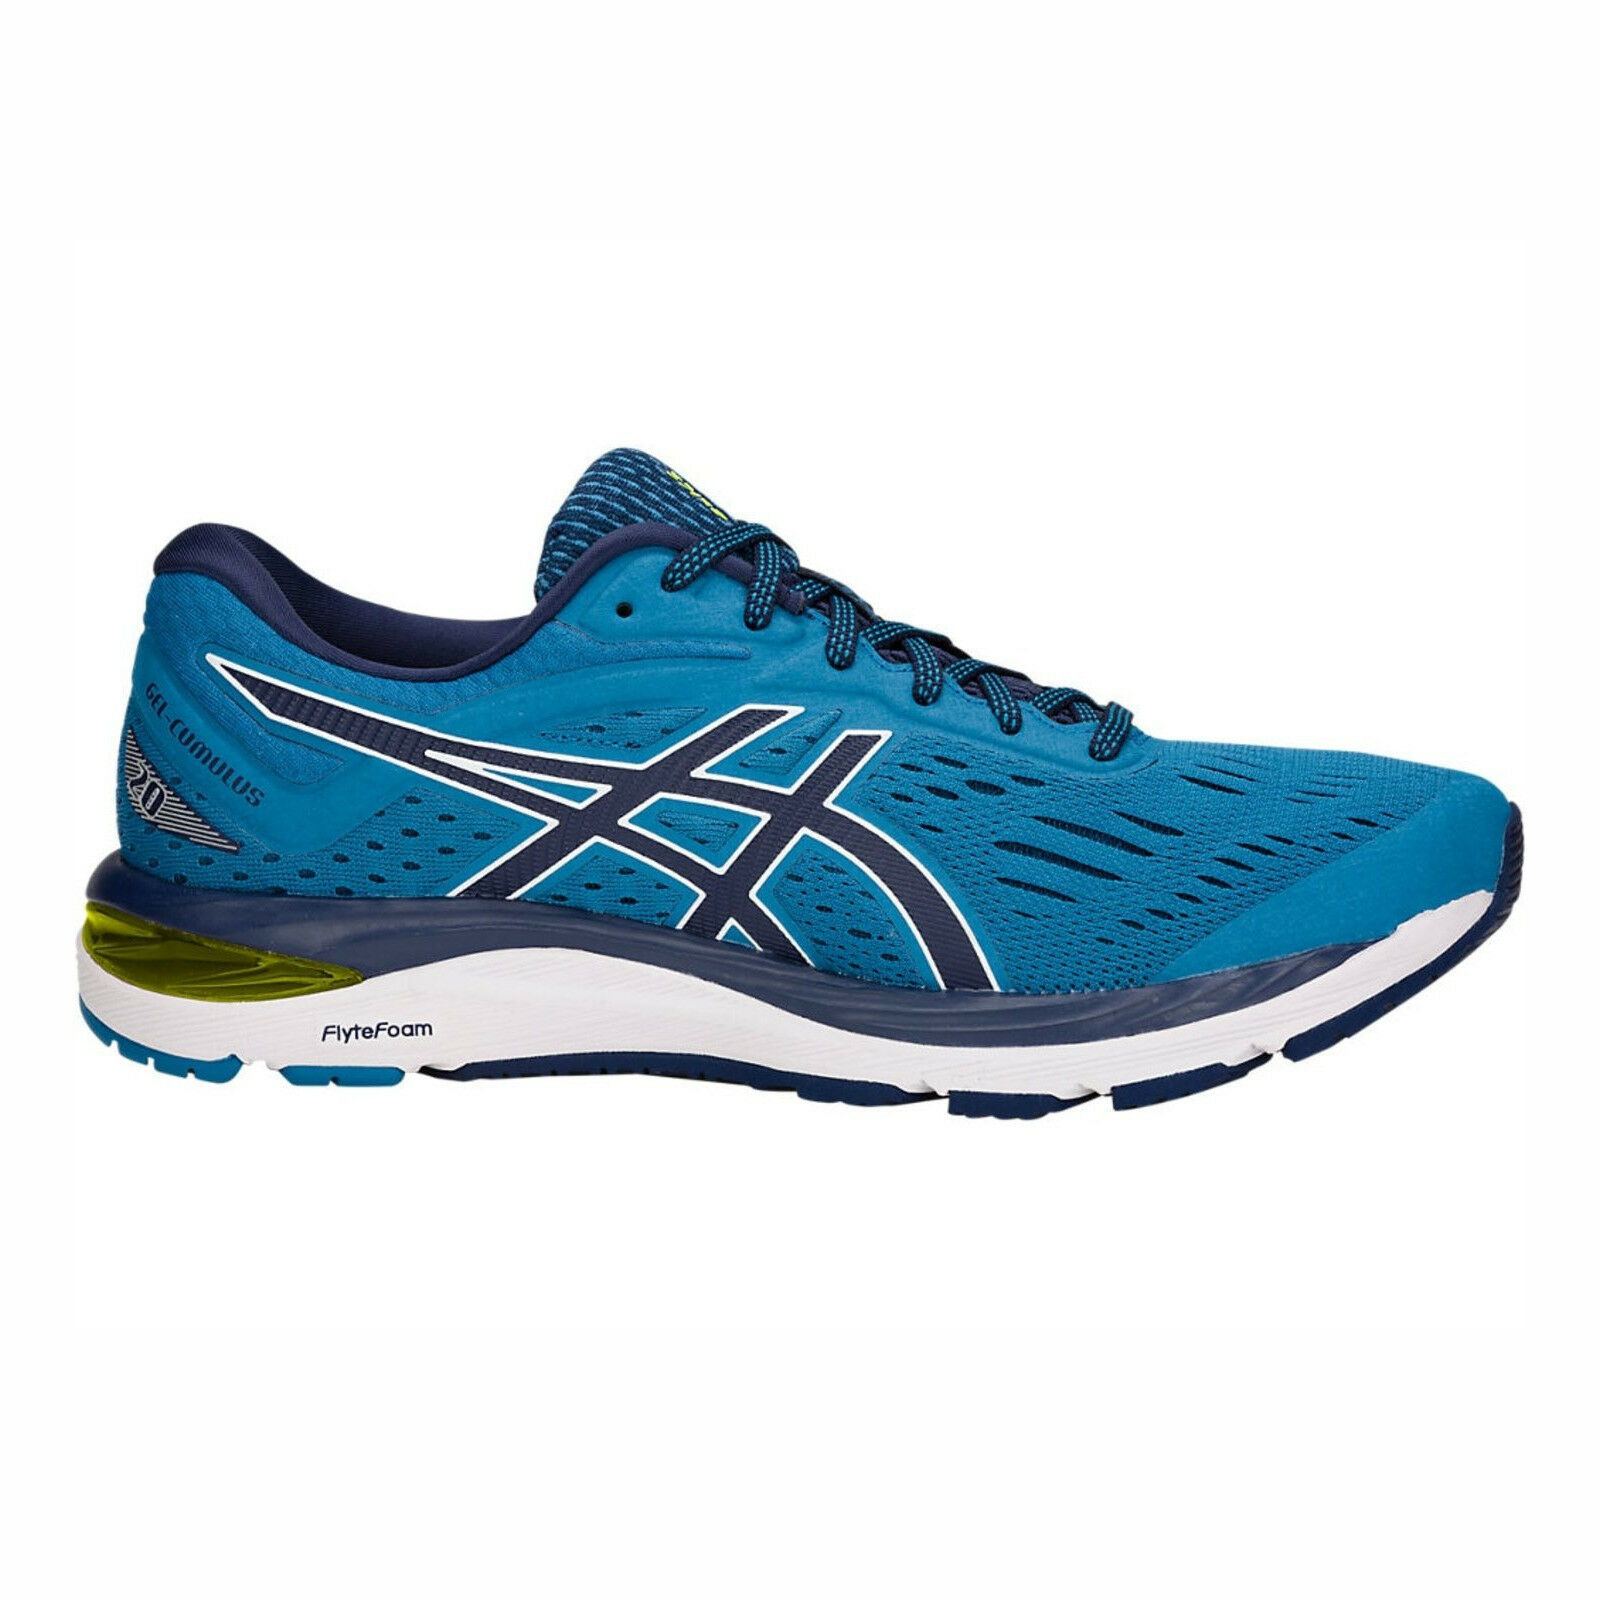 Asics GEL-Cumulus 20 [1011A008-400]  Men Running shoes Race bluee Navy  for sale online